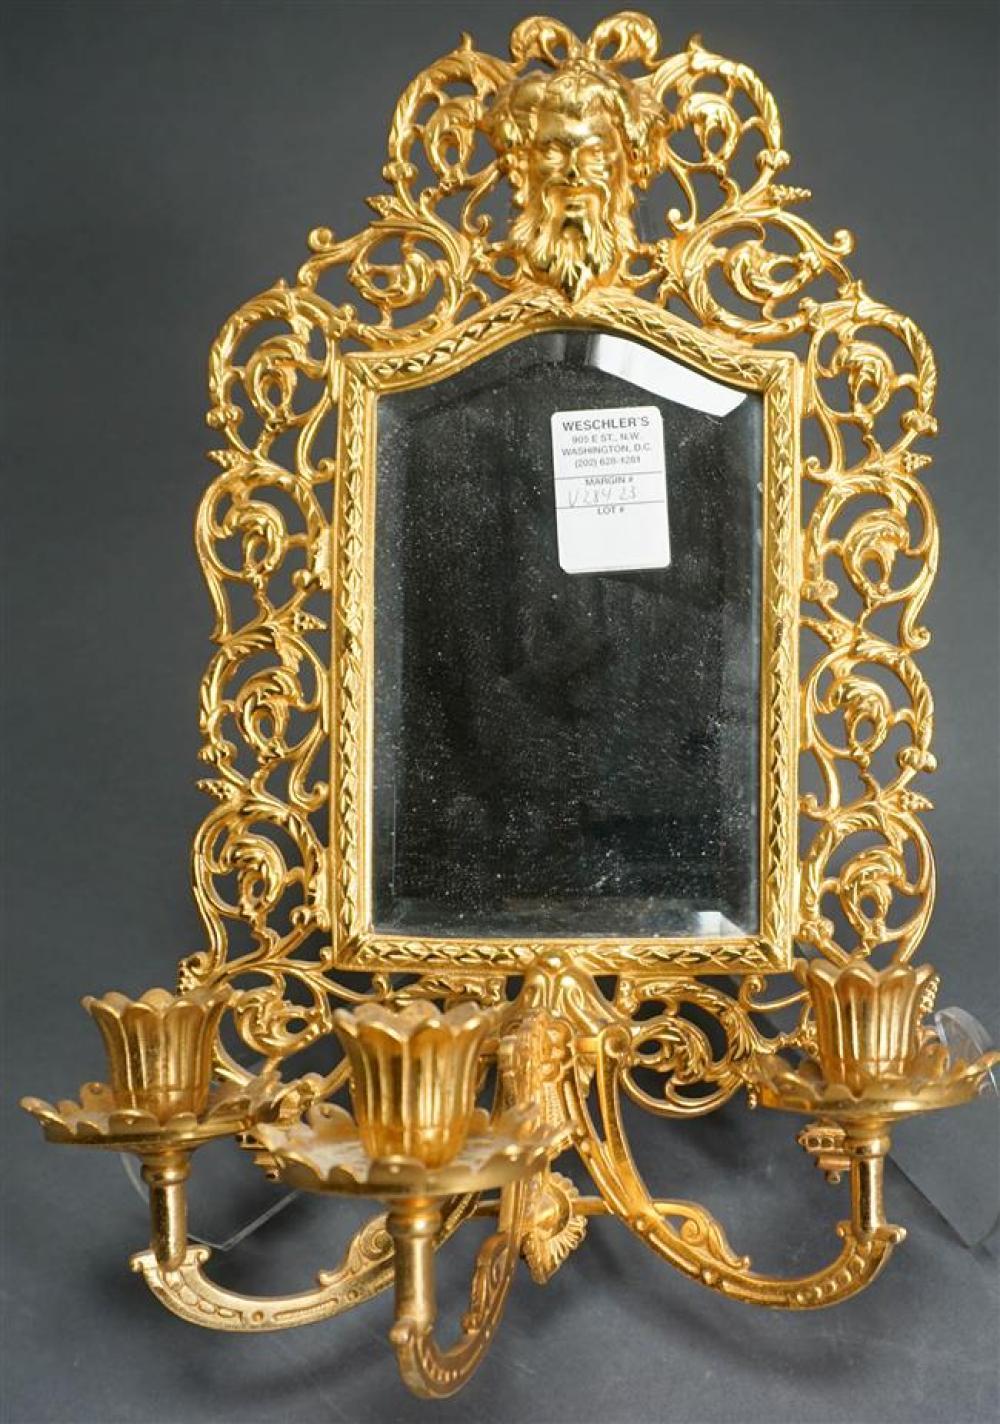 Bradley & Hubbard Gilt Iron Mirrored Three-Light Sconce